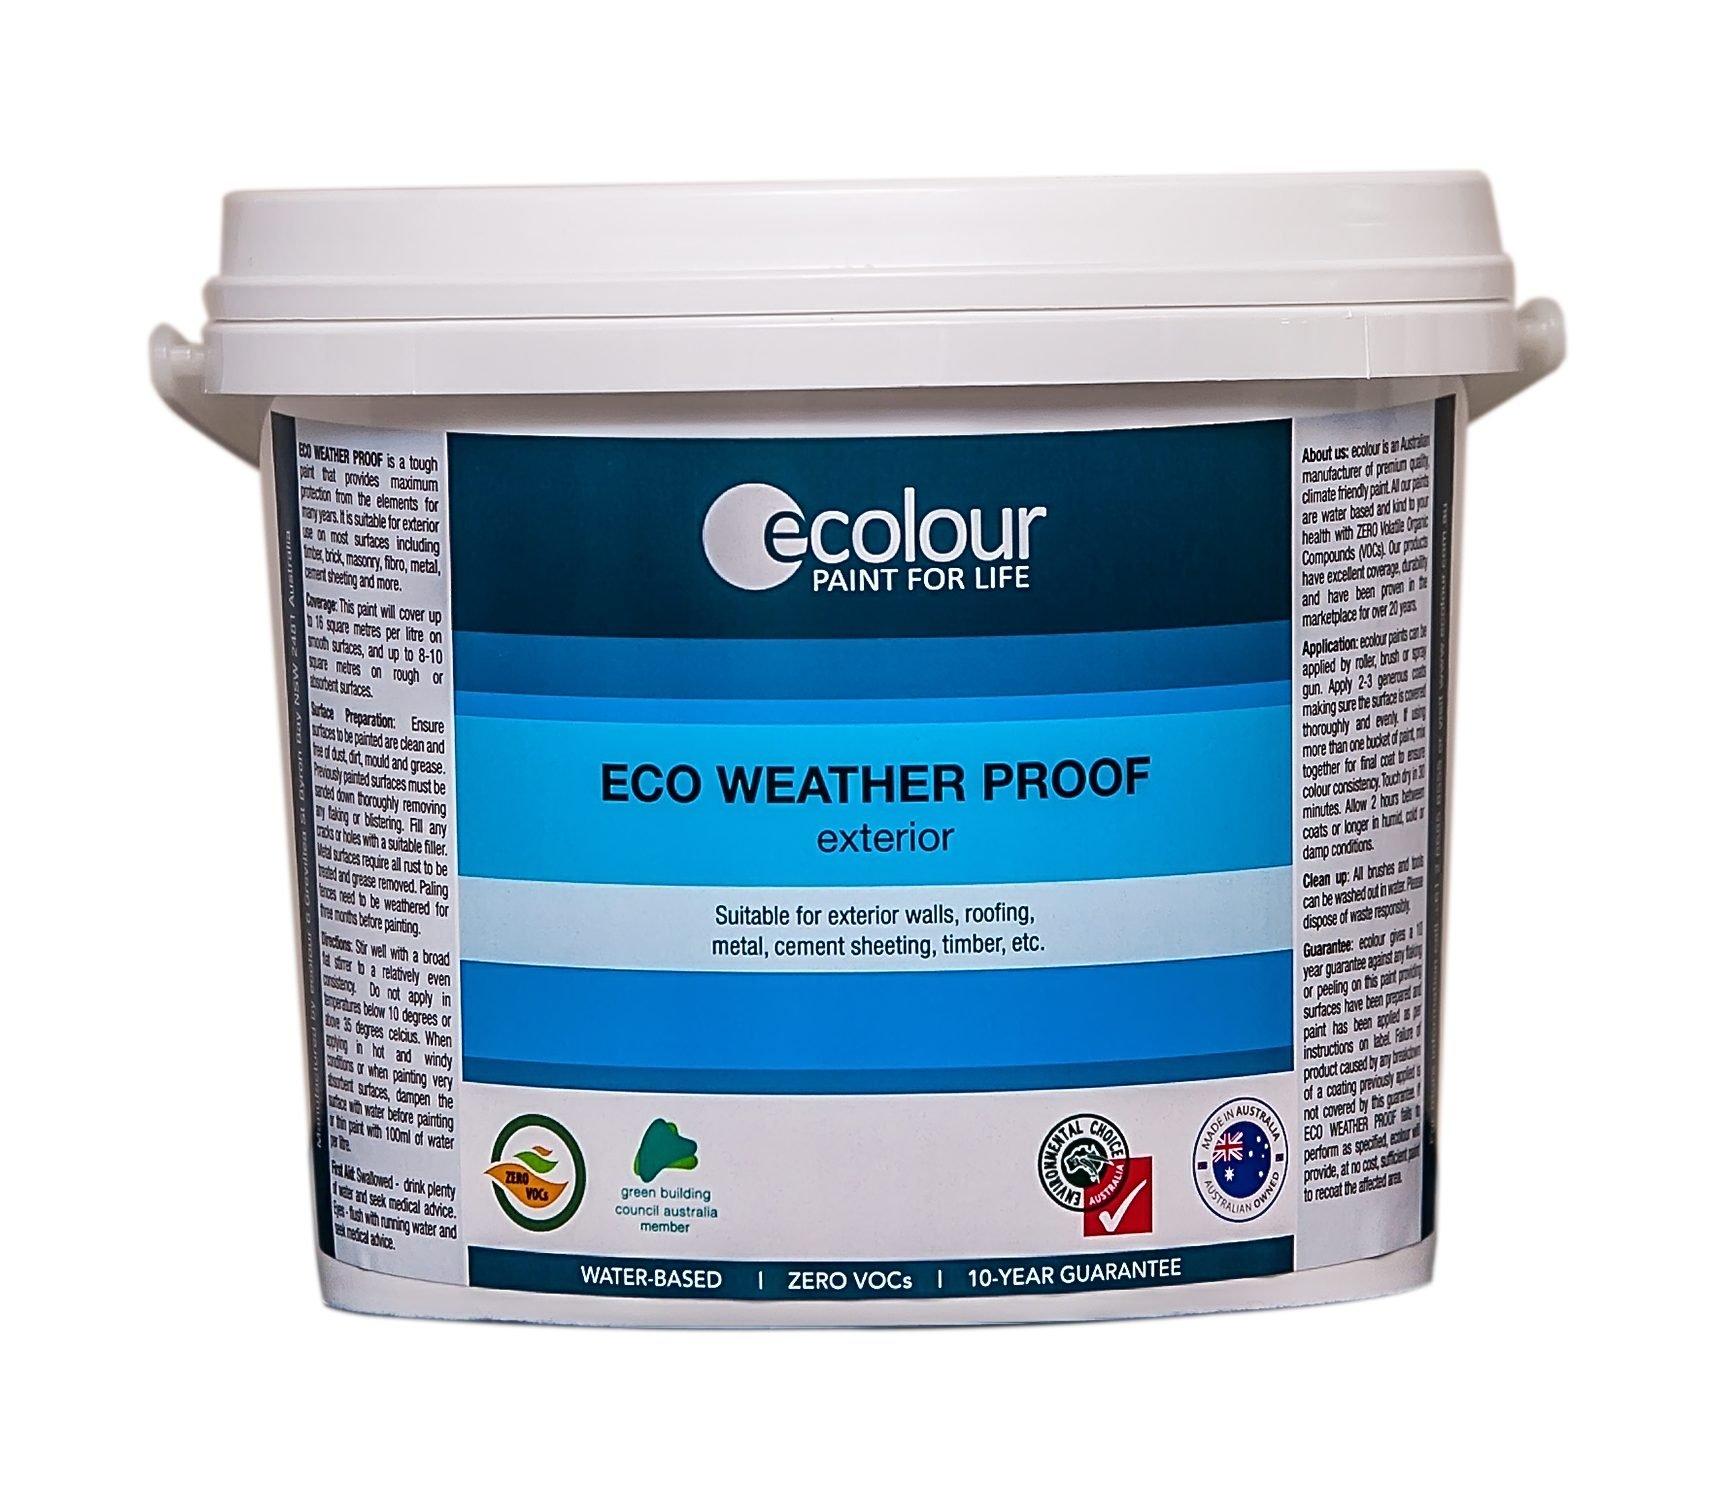 Eco Weather Proof Exterior Ecolour